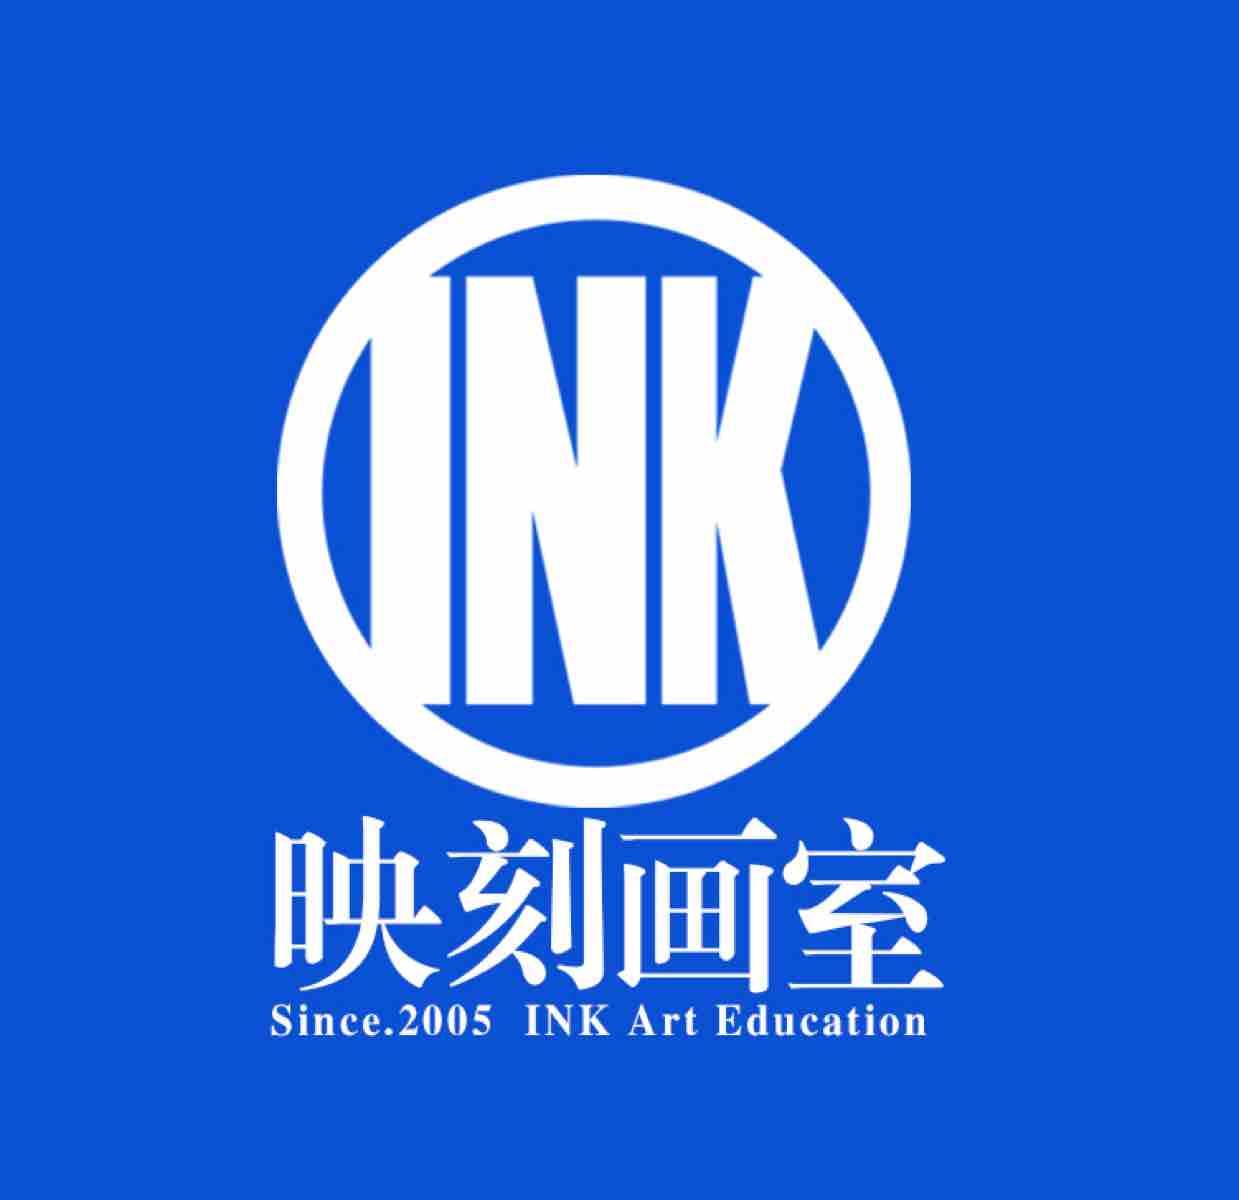 天津INK映刻画室